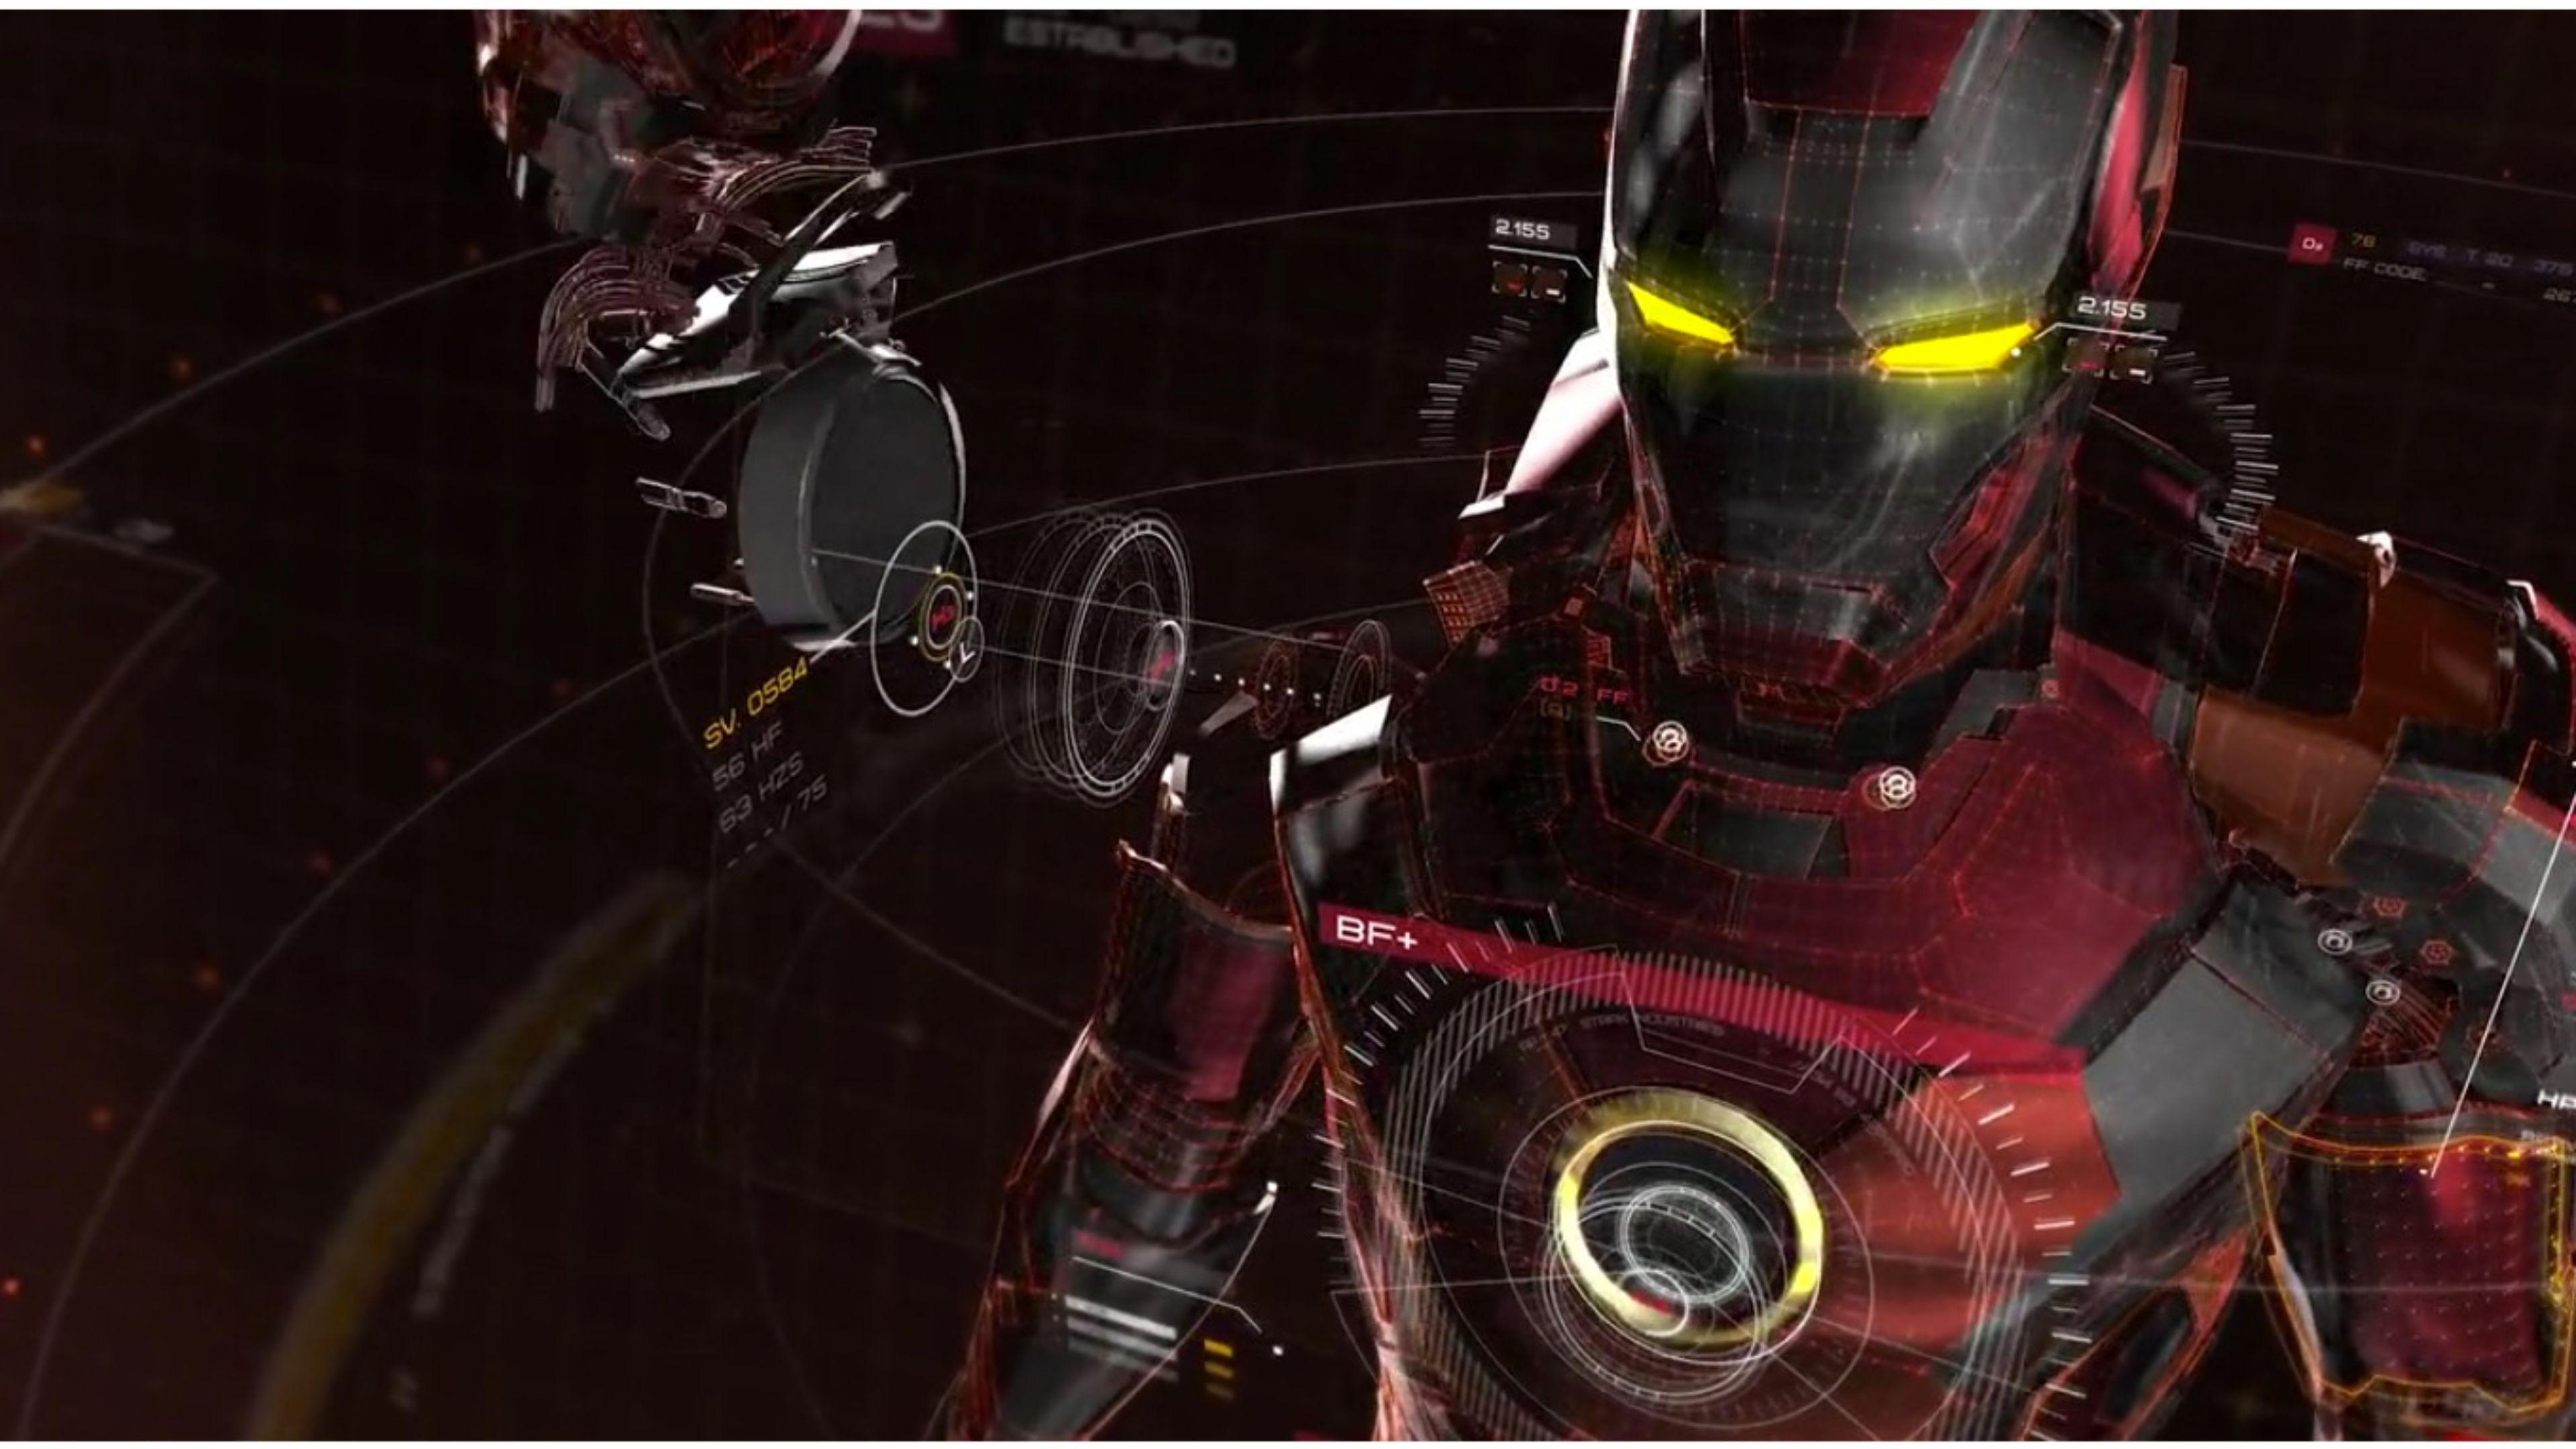 Iron Man 2016 Avengers Age Of Ultron 4k Wallpaper